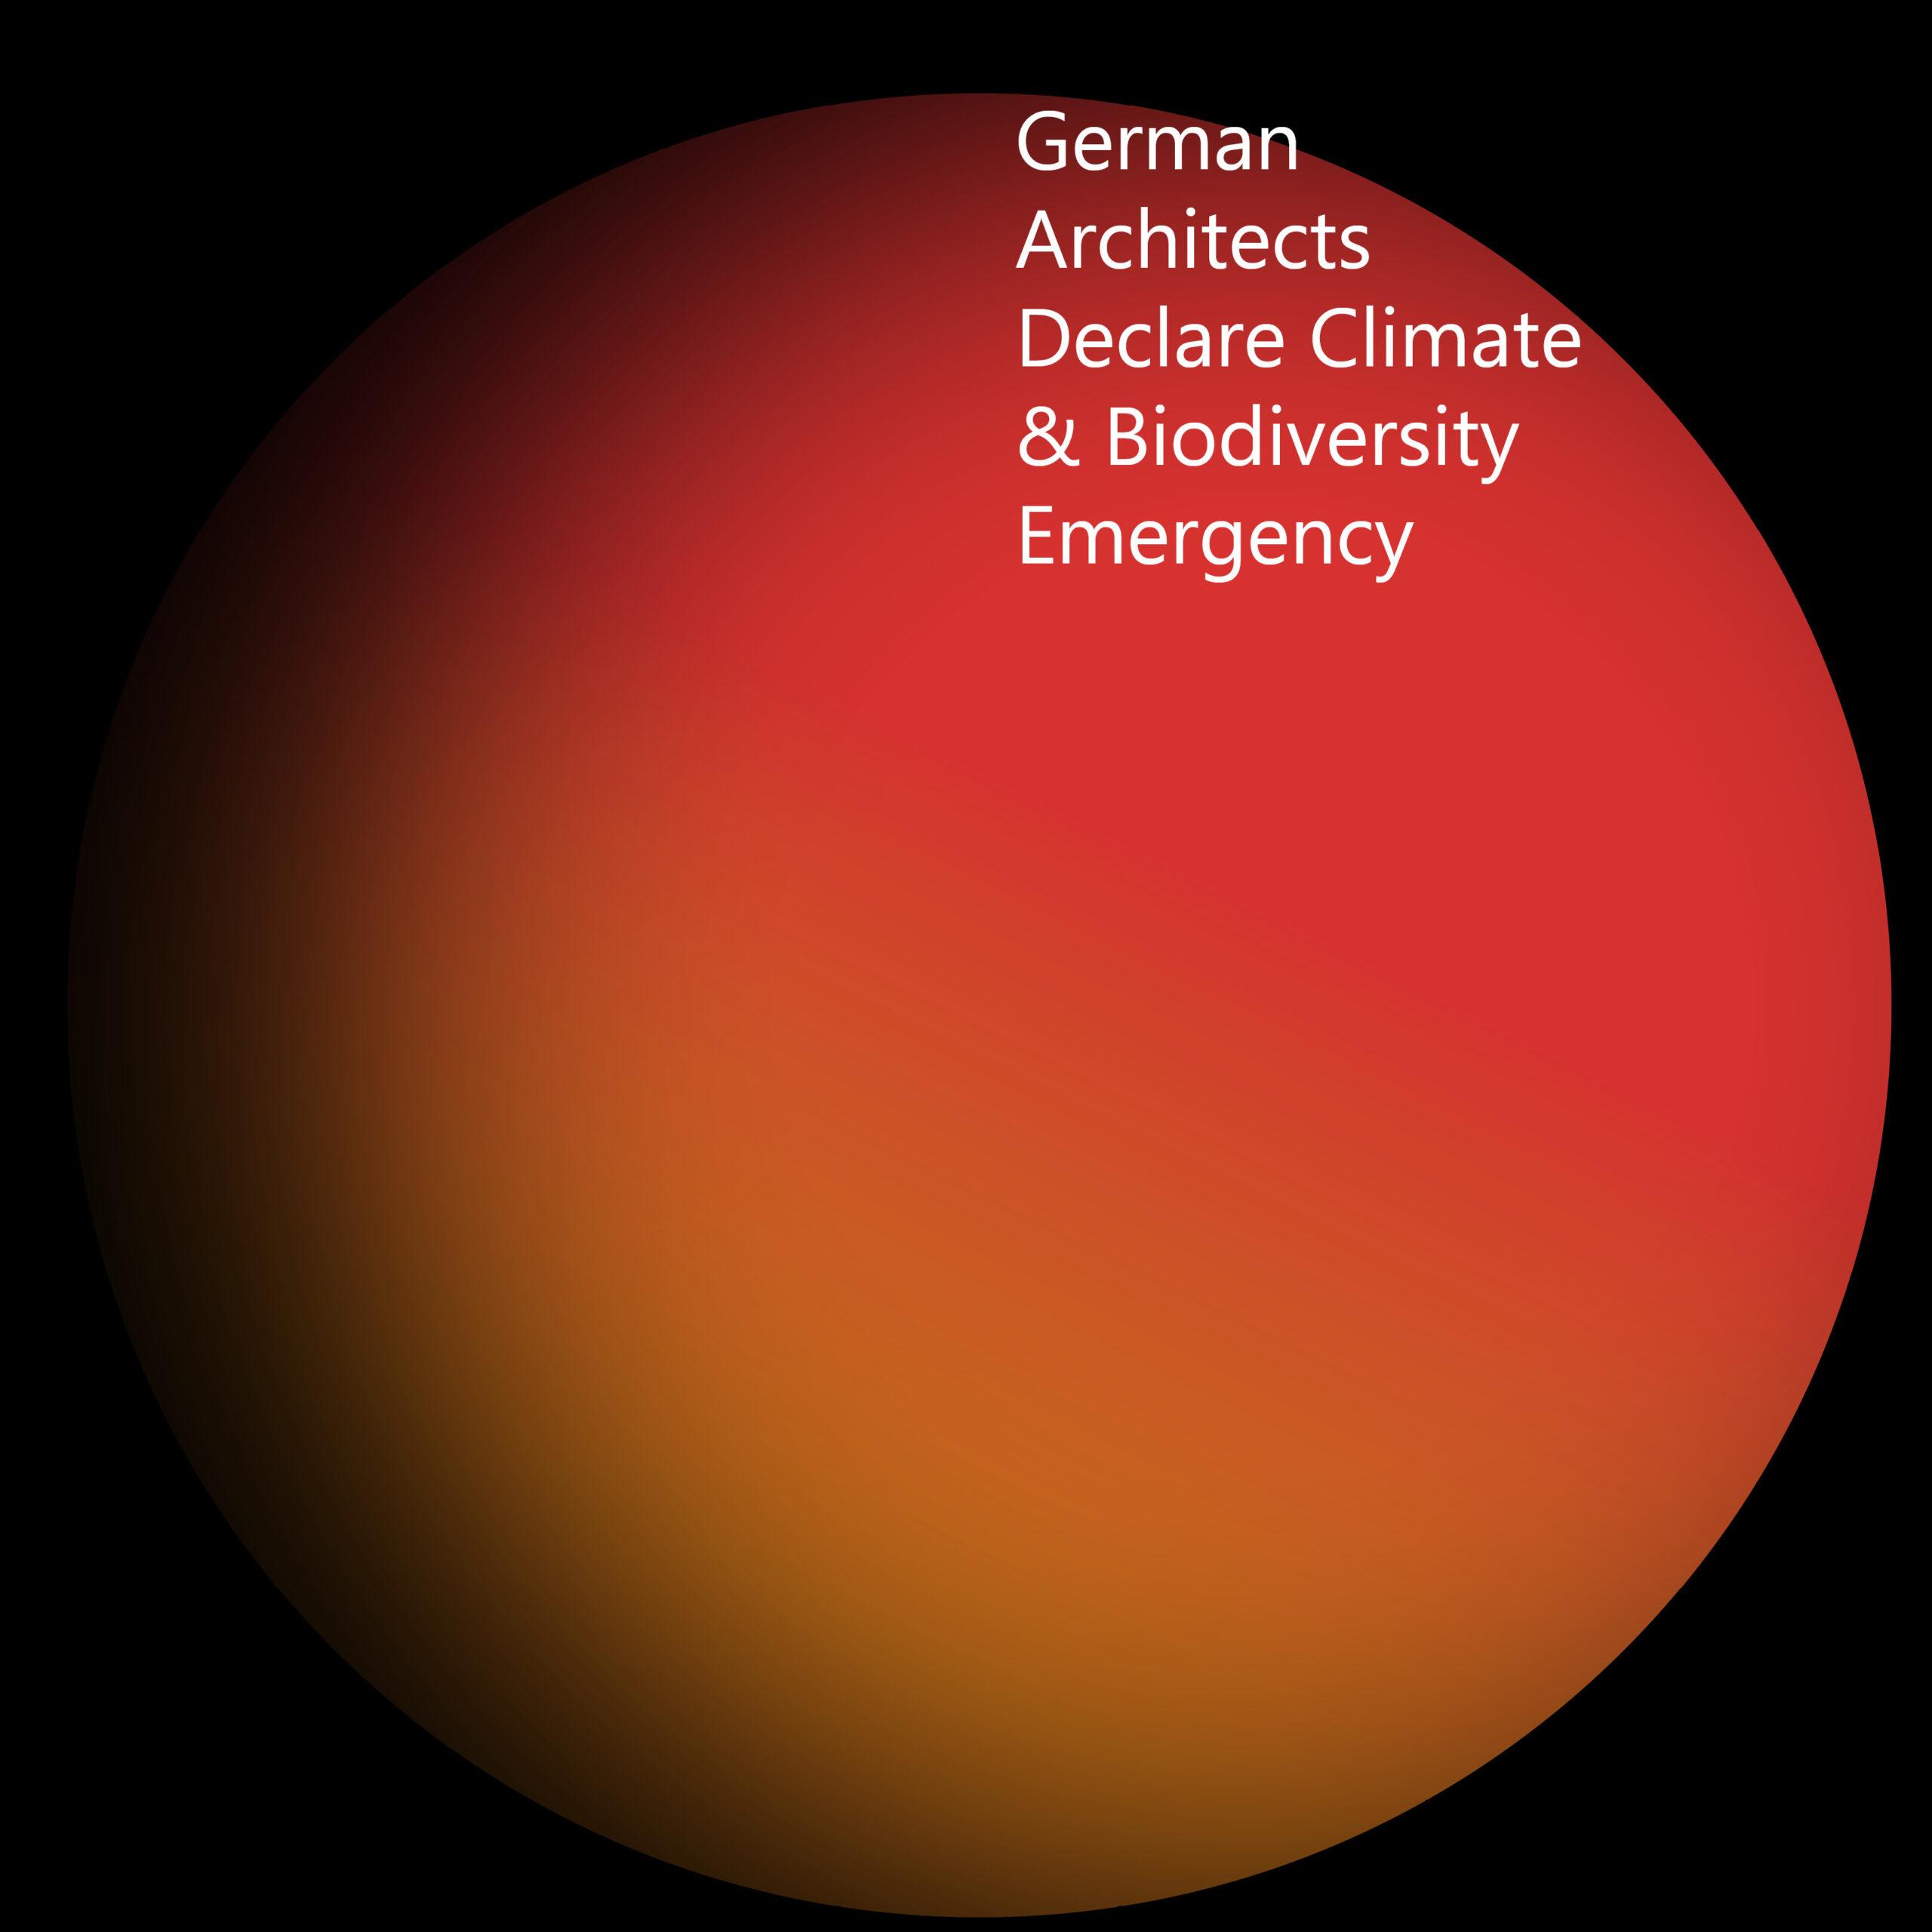 Logo German Architects Declare Climate & Biodiversity Emergency FFM-ARCHITEKTEN